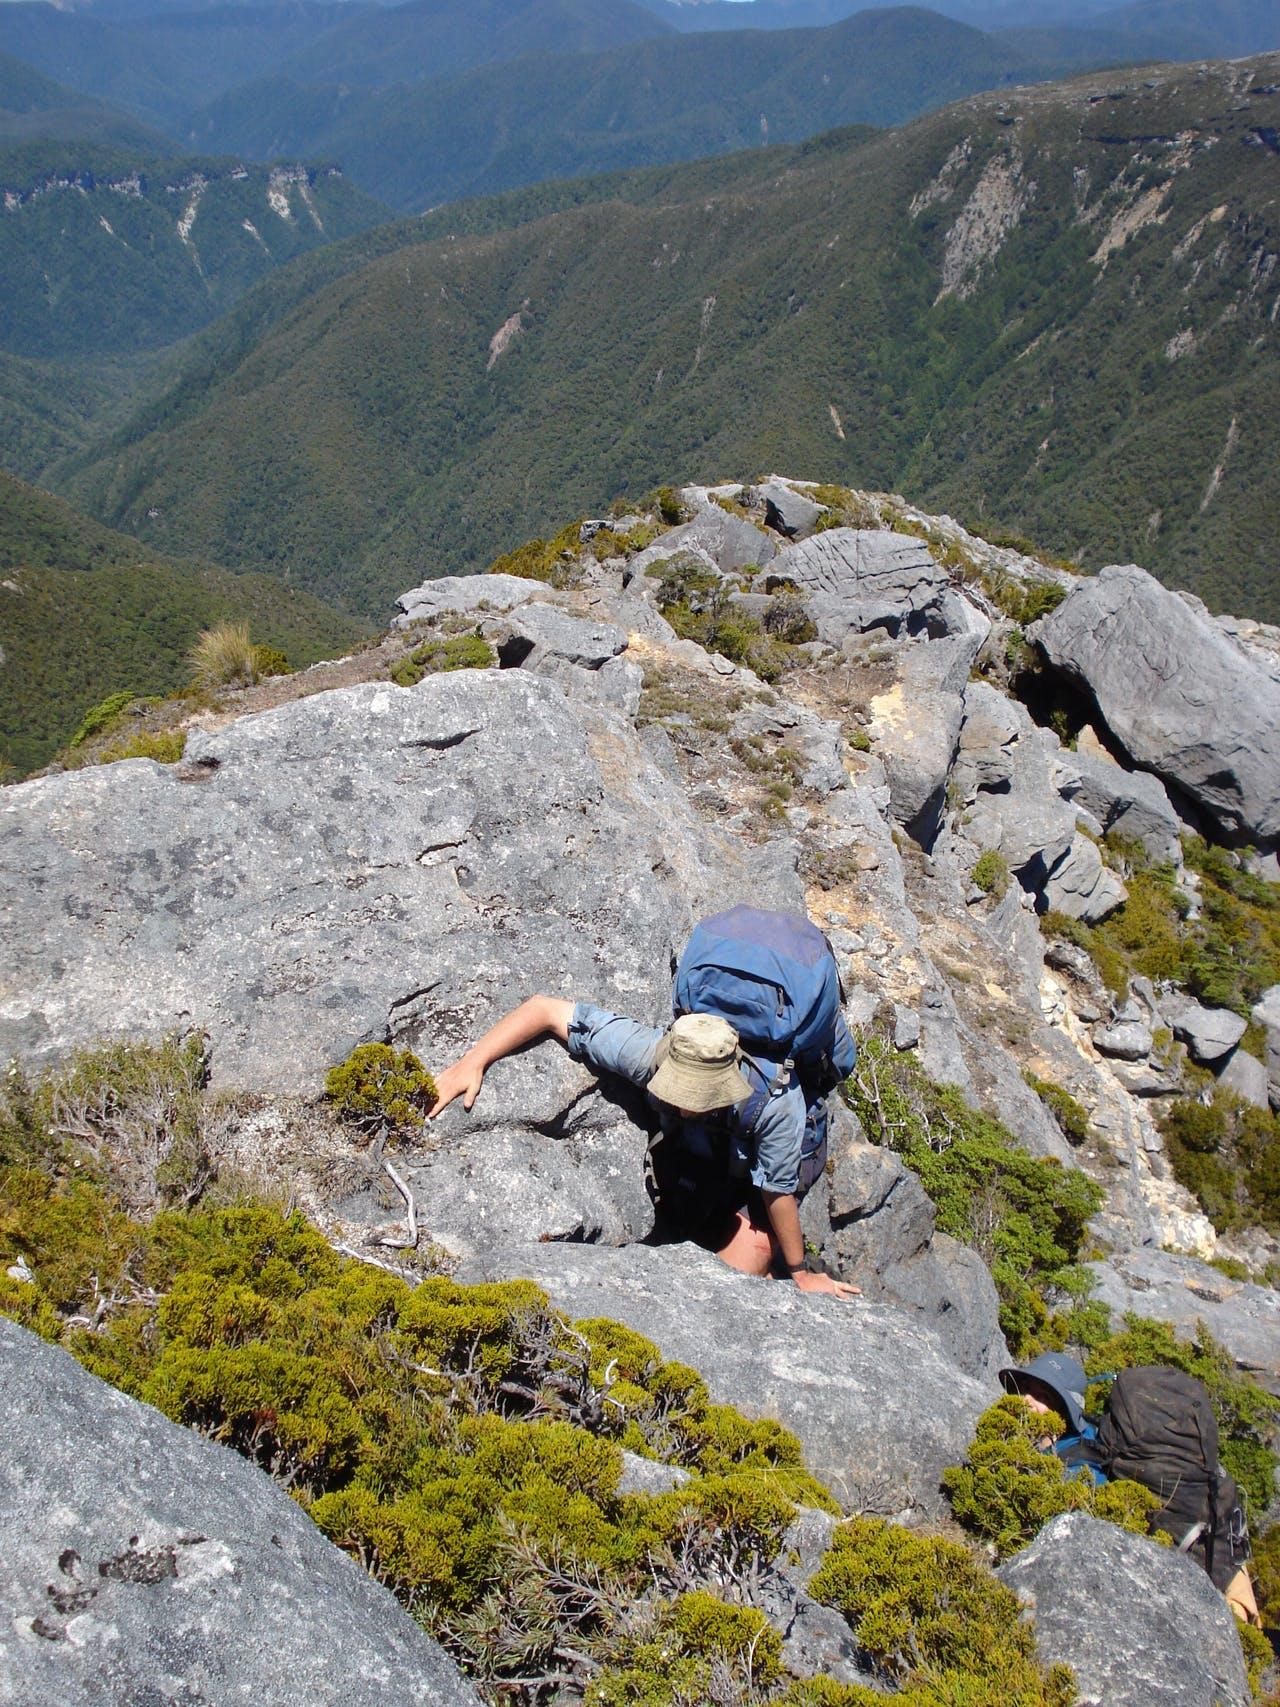 Ascending the spur onto the Garibaldi plateau. Photo: Hannah McGregor